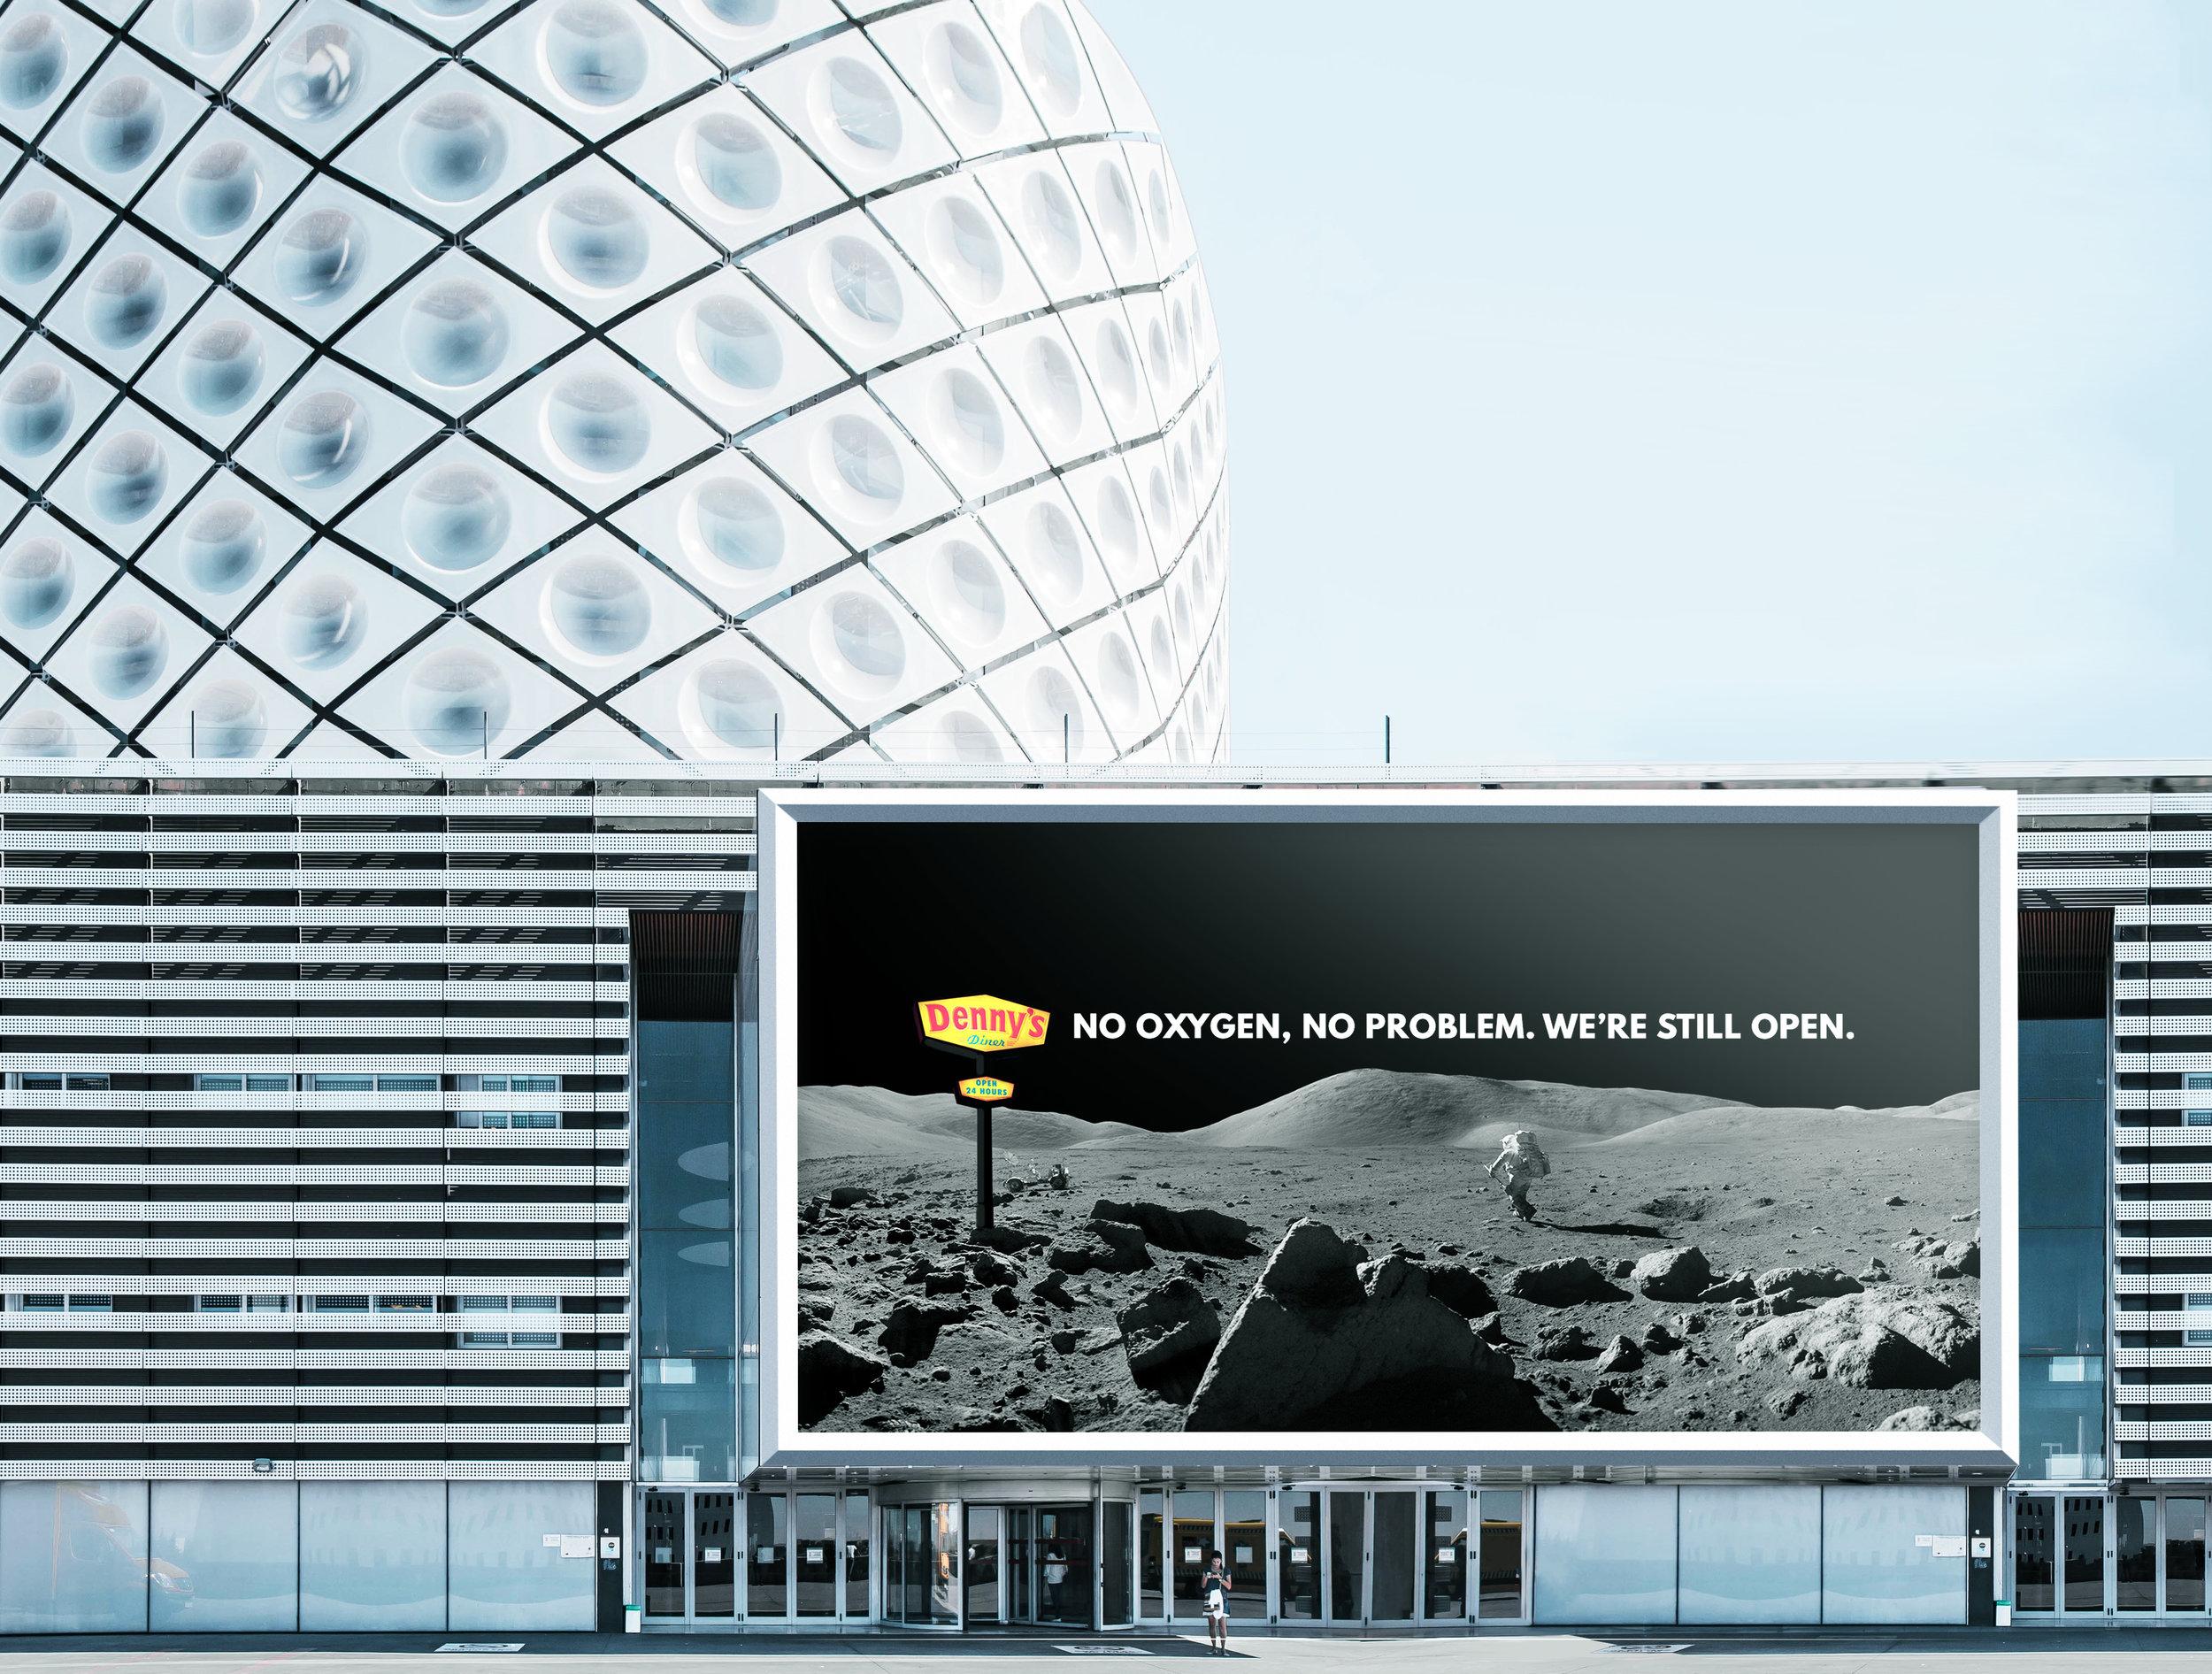 dennys billboard1.jpg